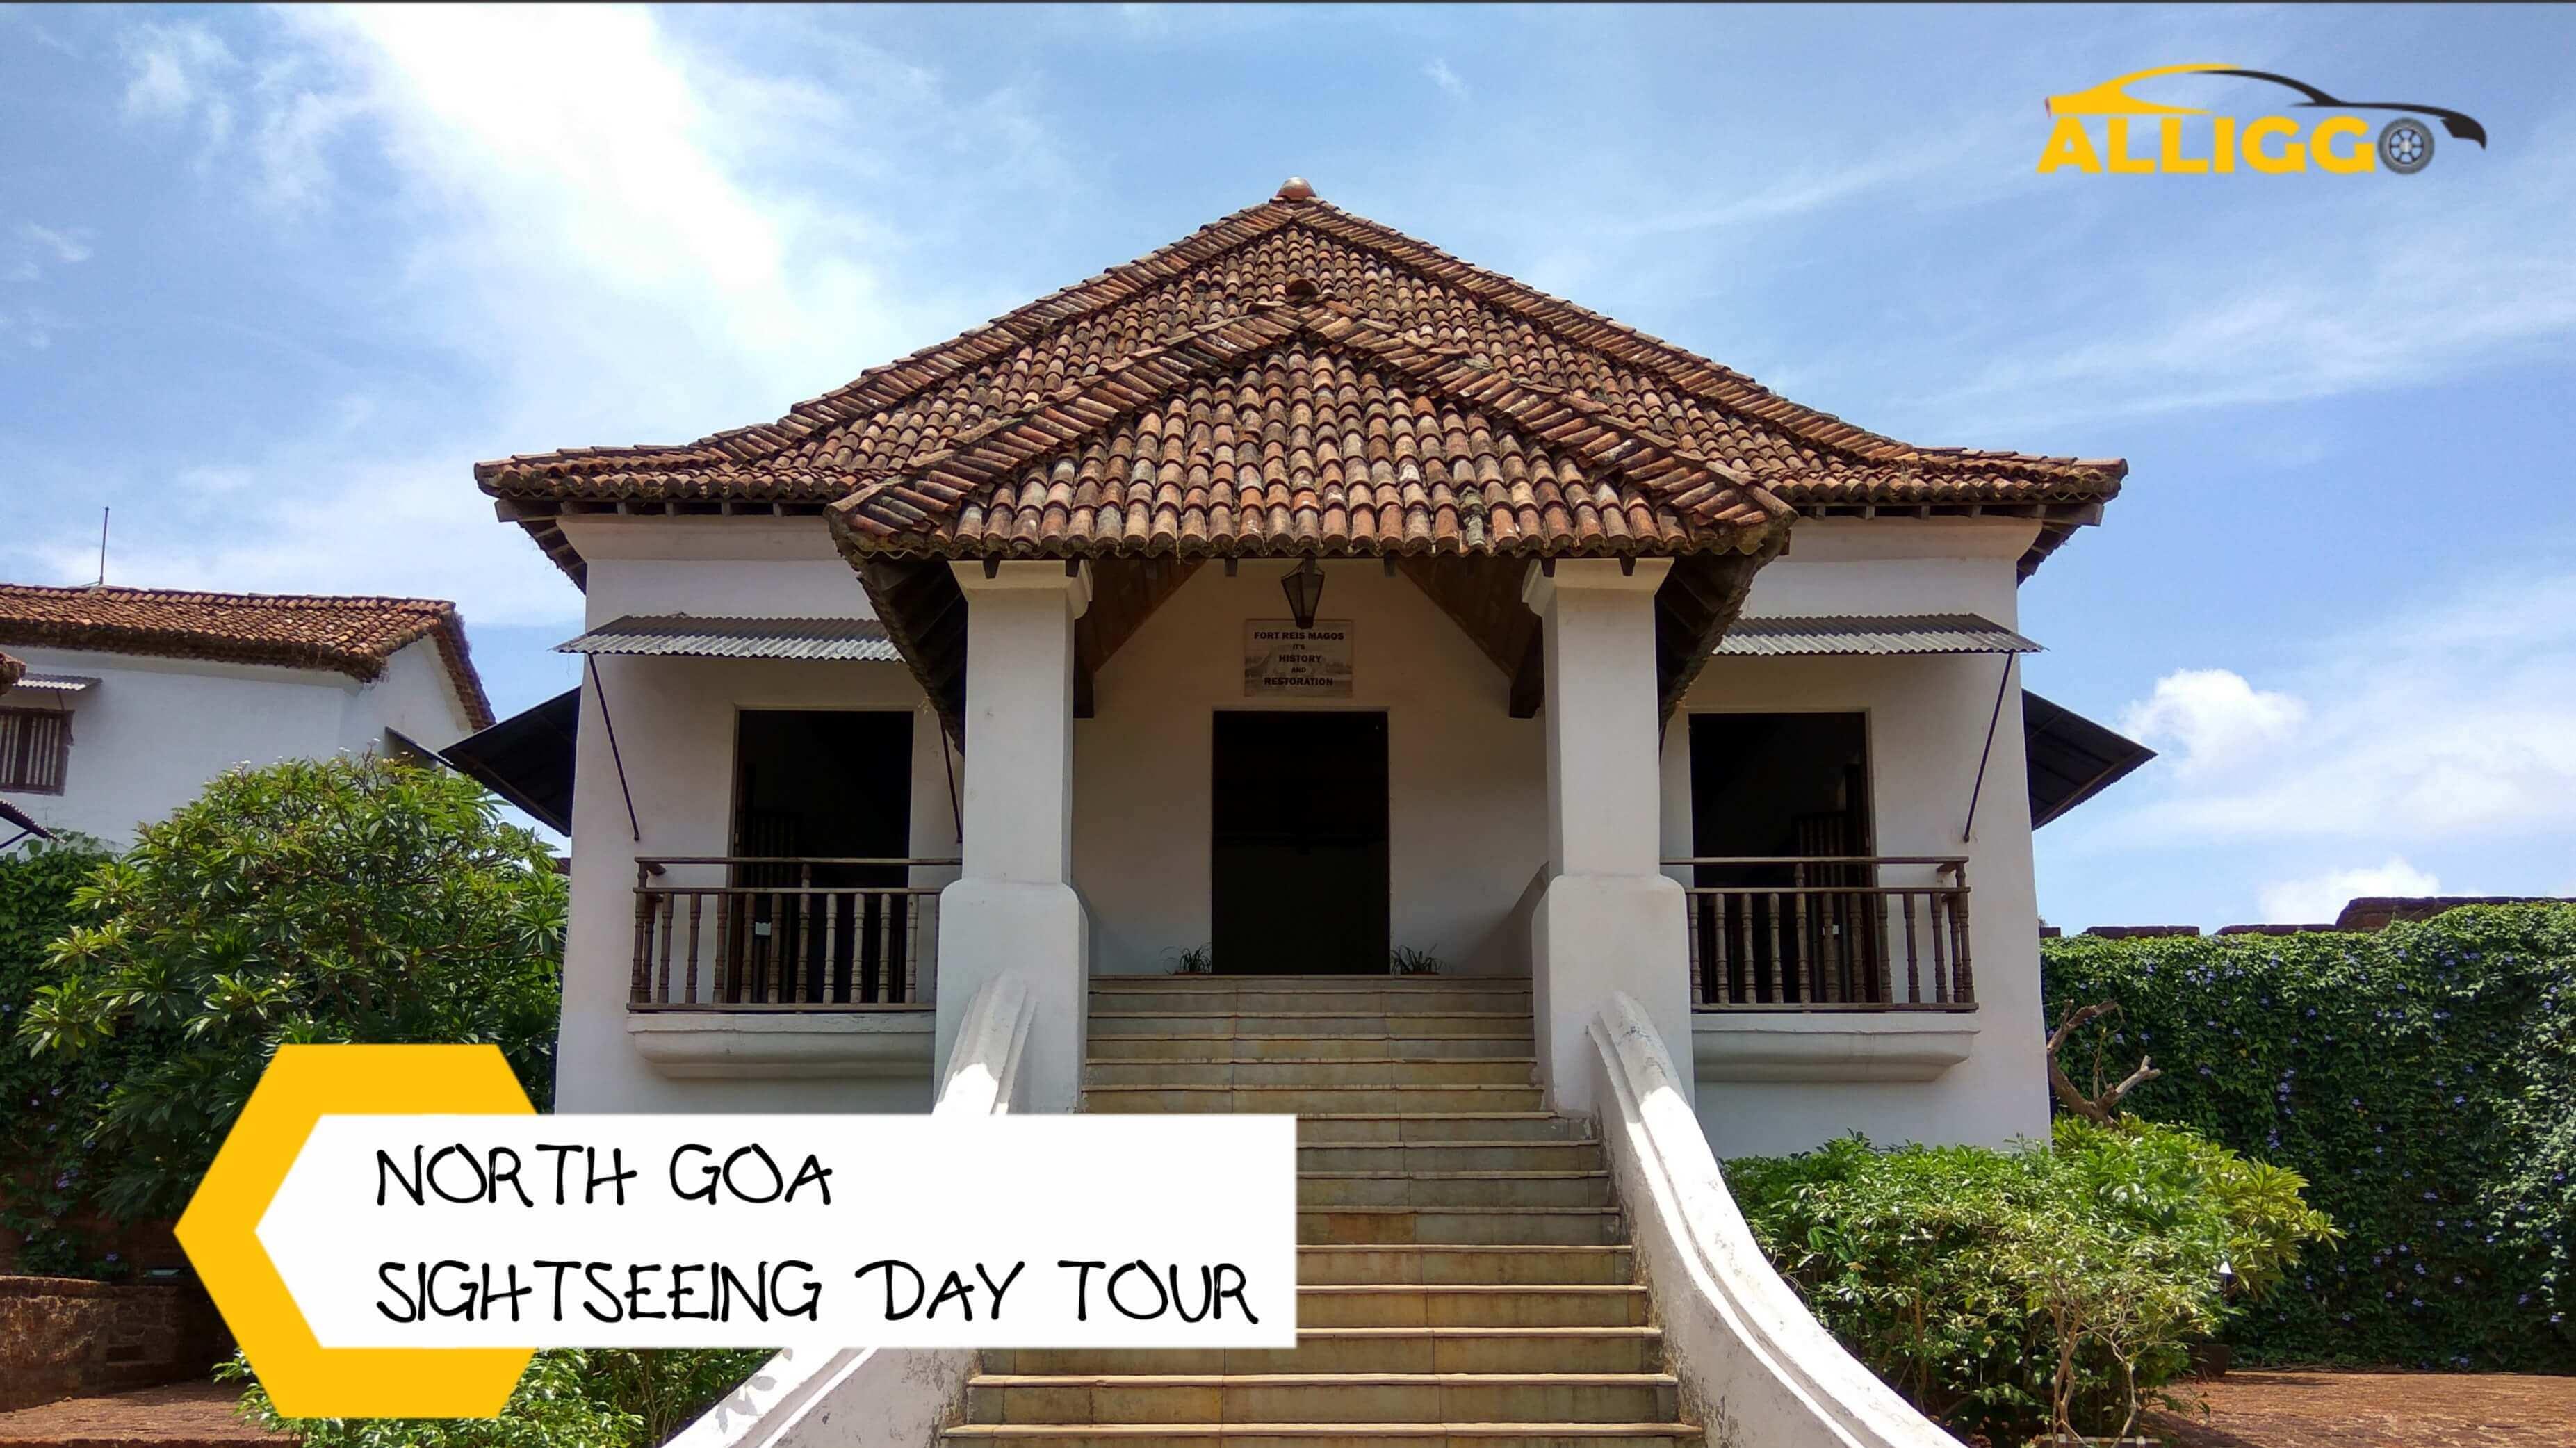 Alliggo_Car_Rentals_North_Goa_Sightseeing_Day_Tour